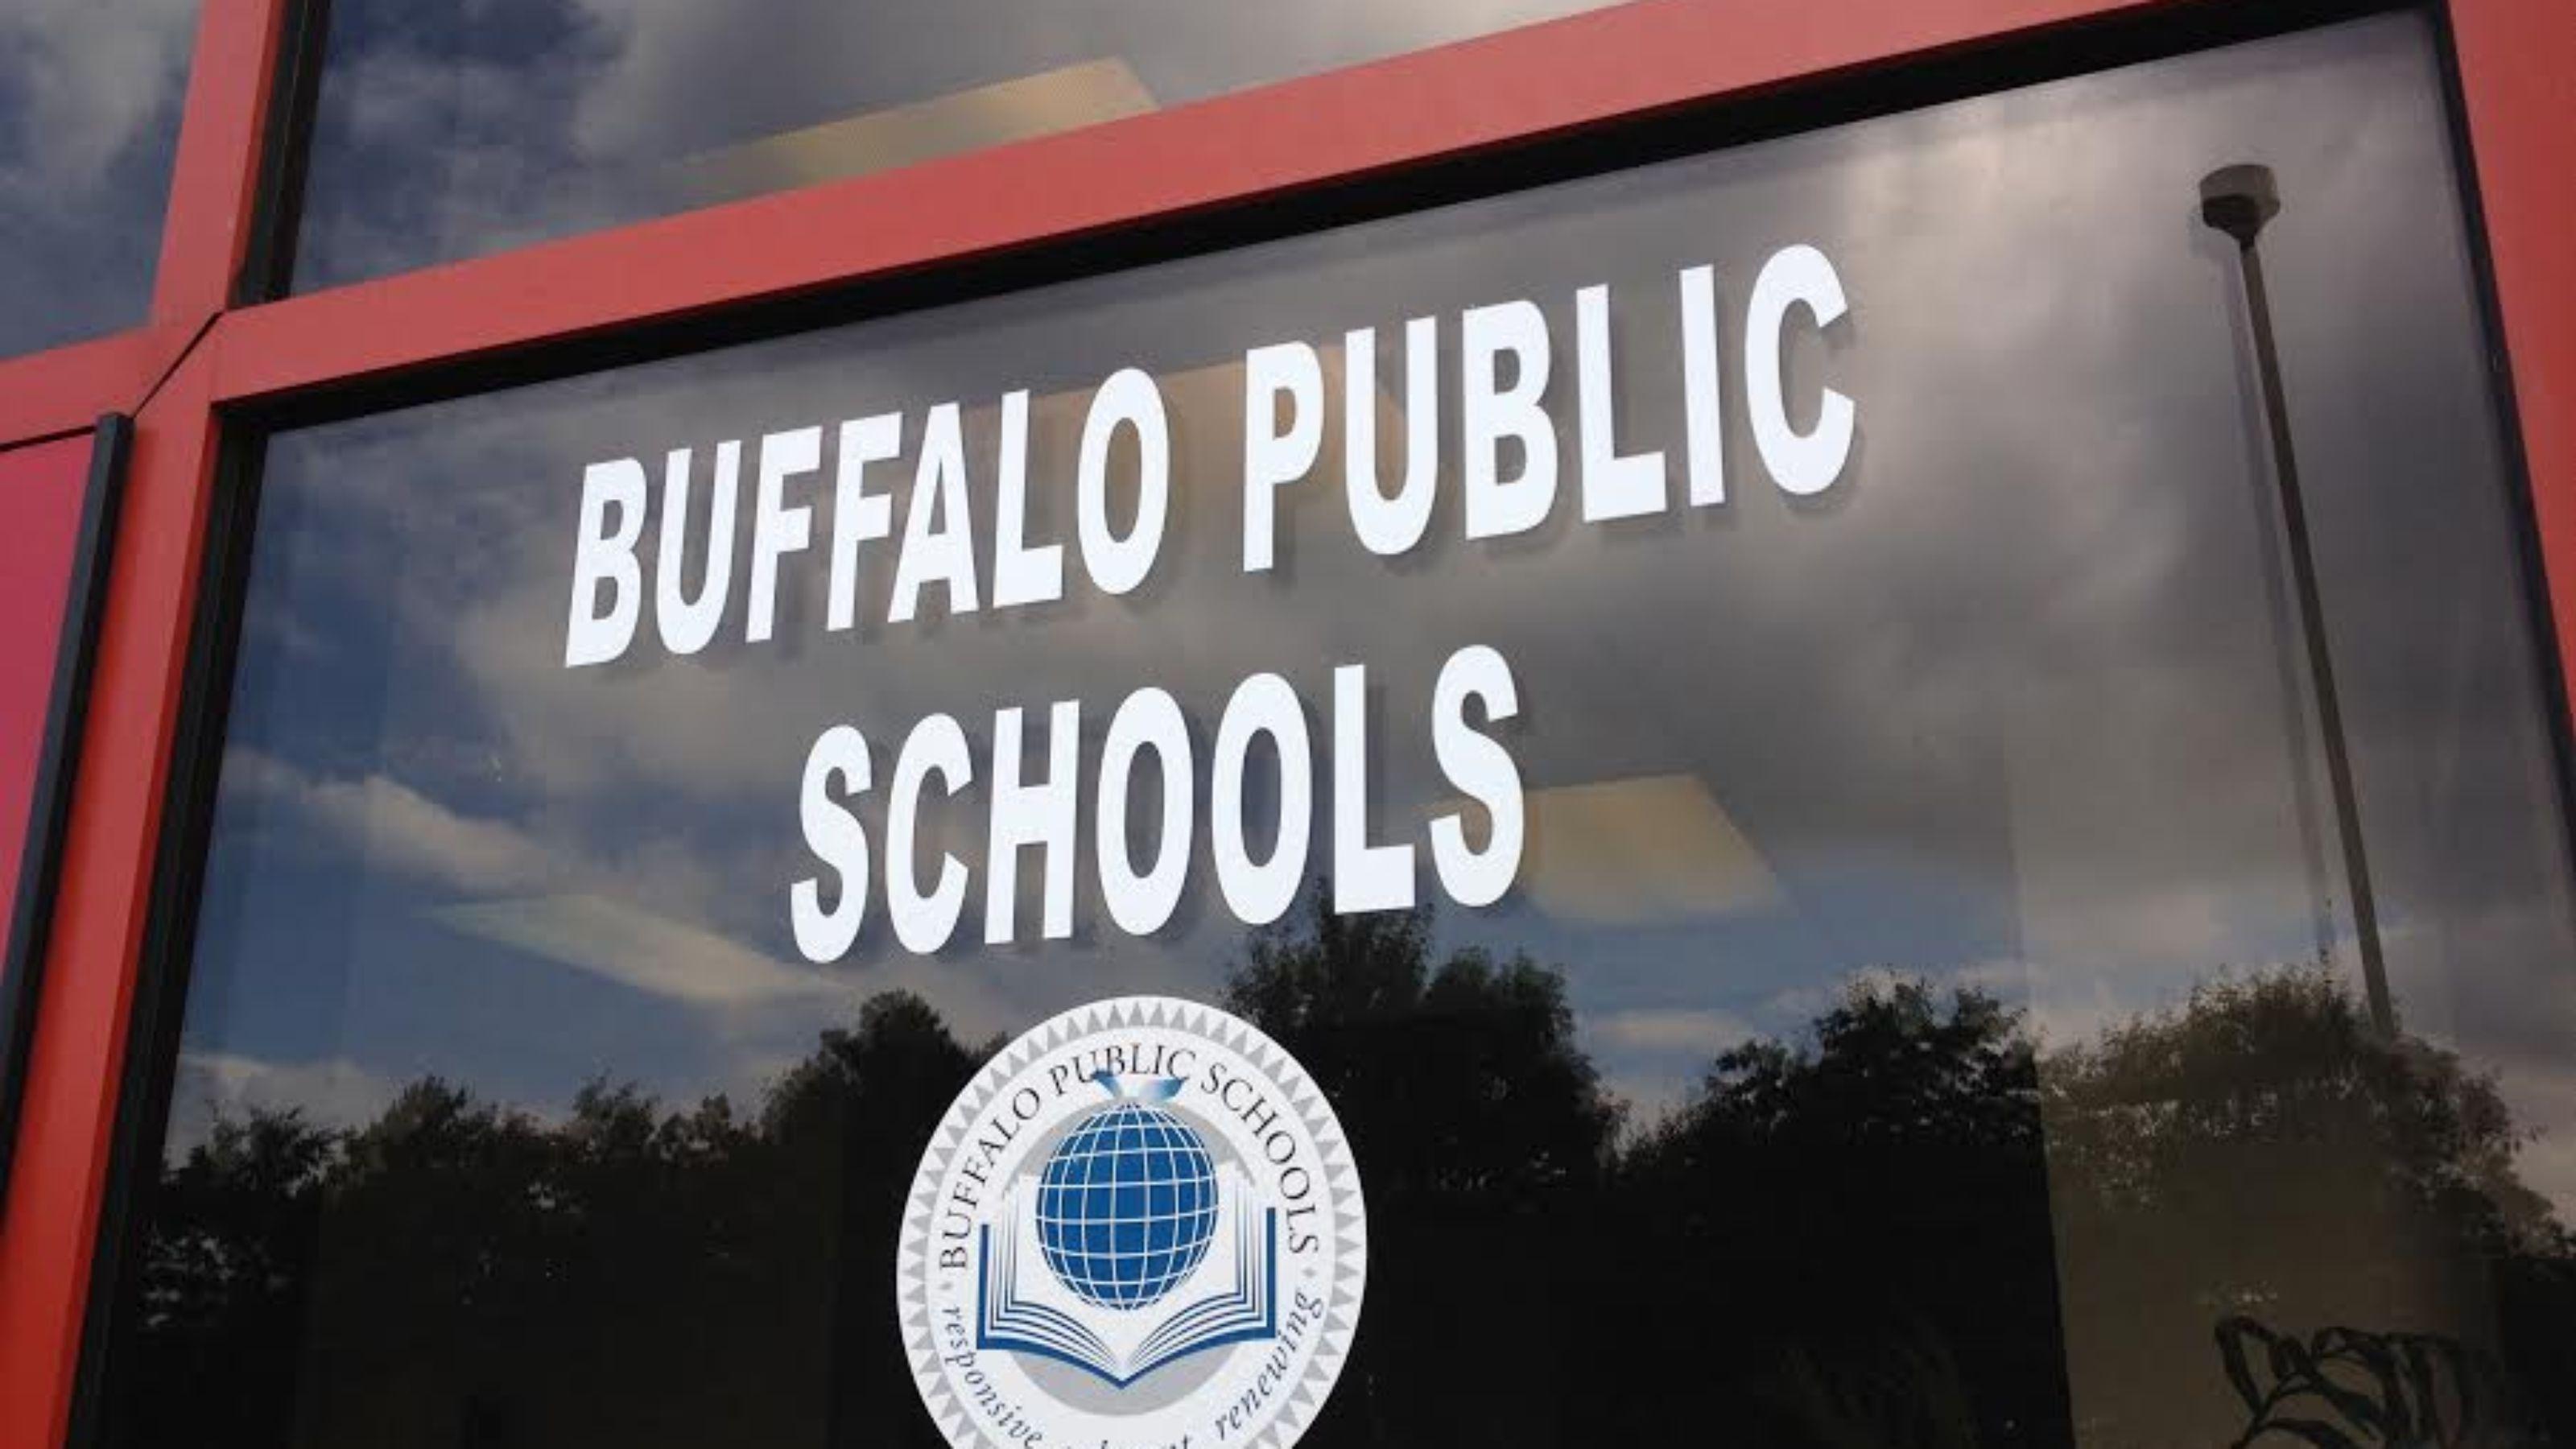 635487973548890274-buffalo-public-schools-sign